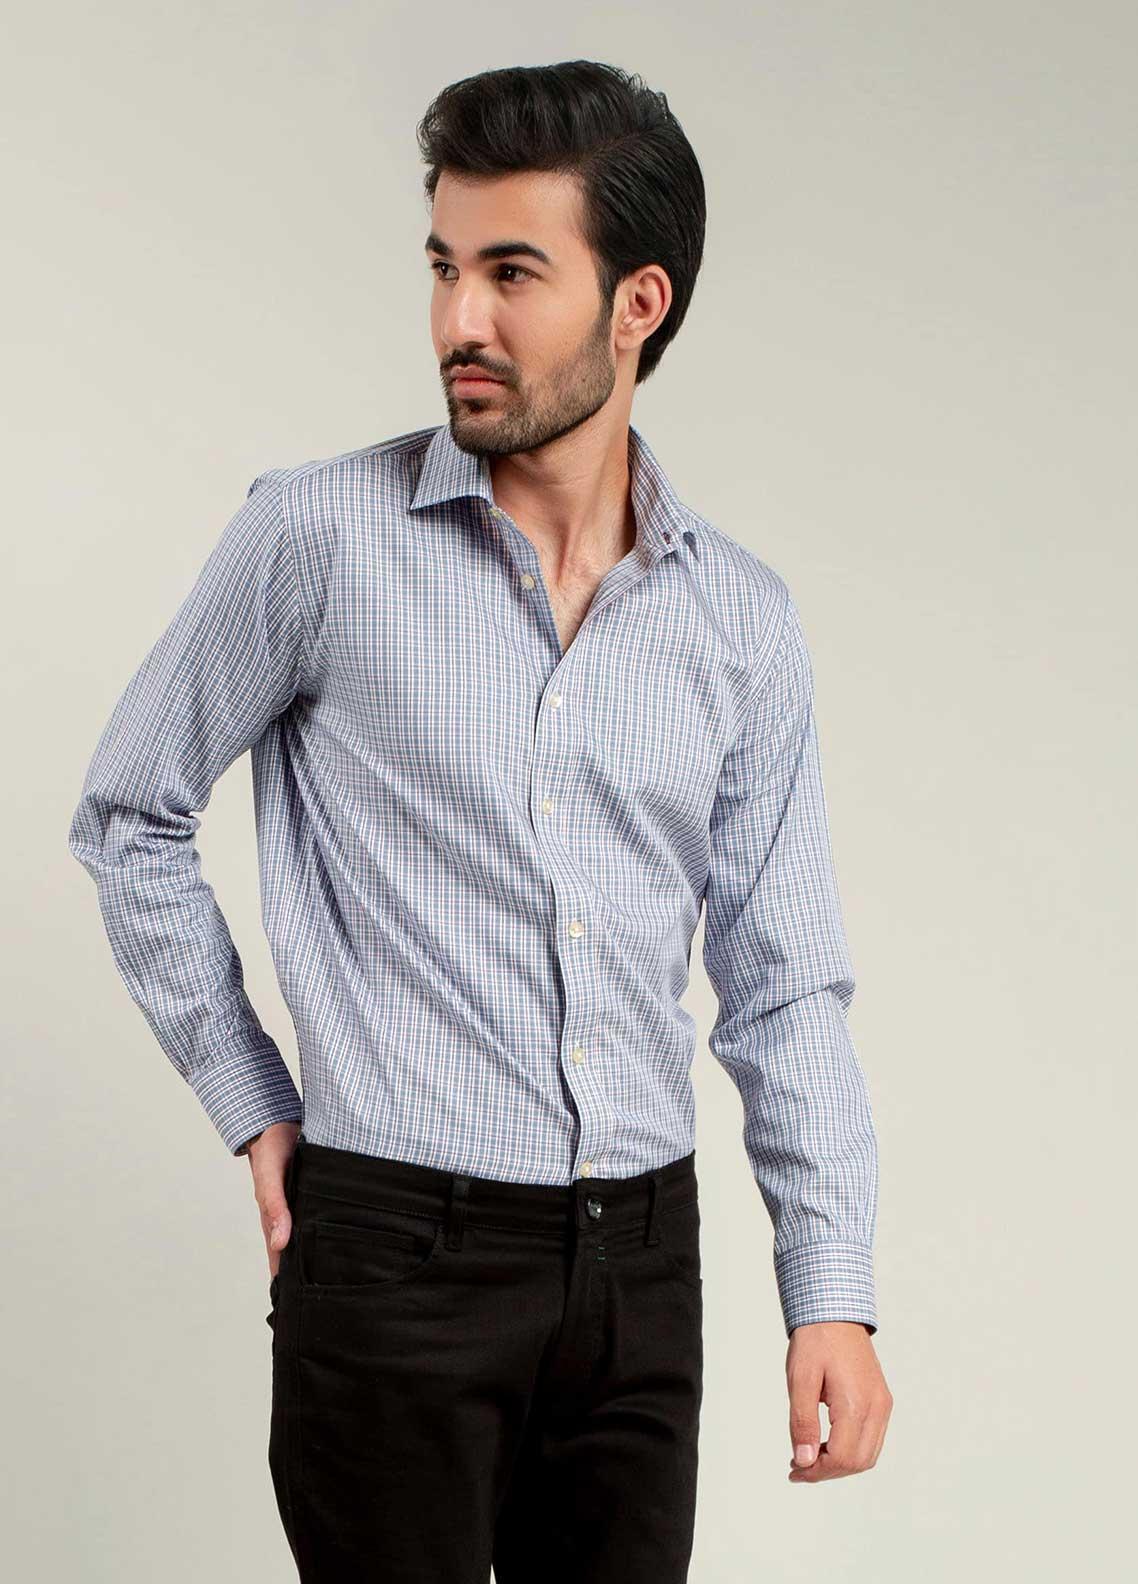 Brumano Cotton Formal Shirts for Men -  BM20LS Blue & Purple Formal Shirt